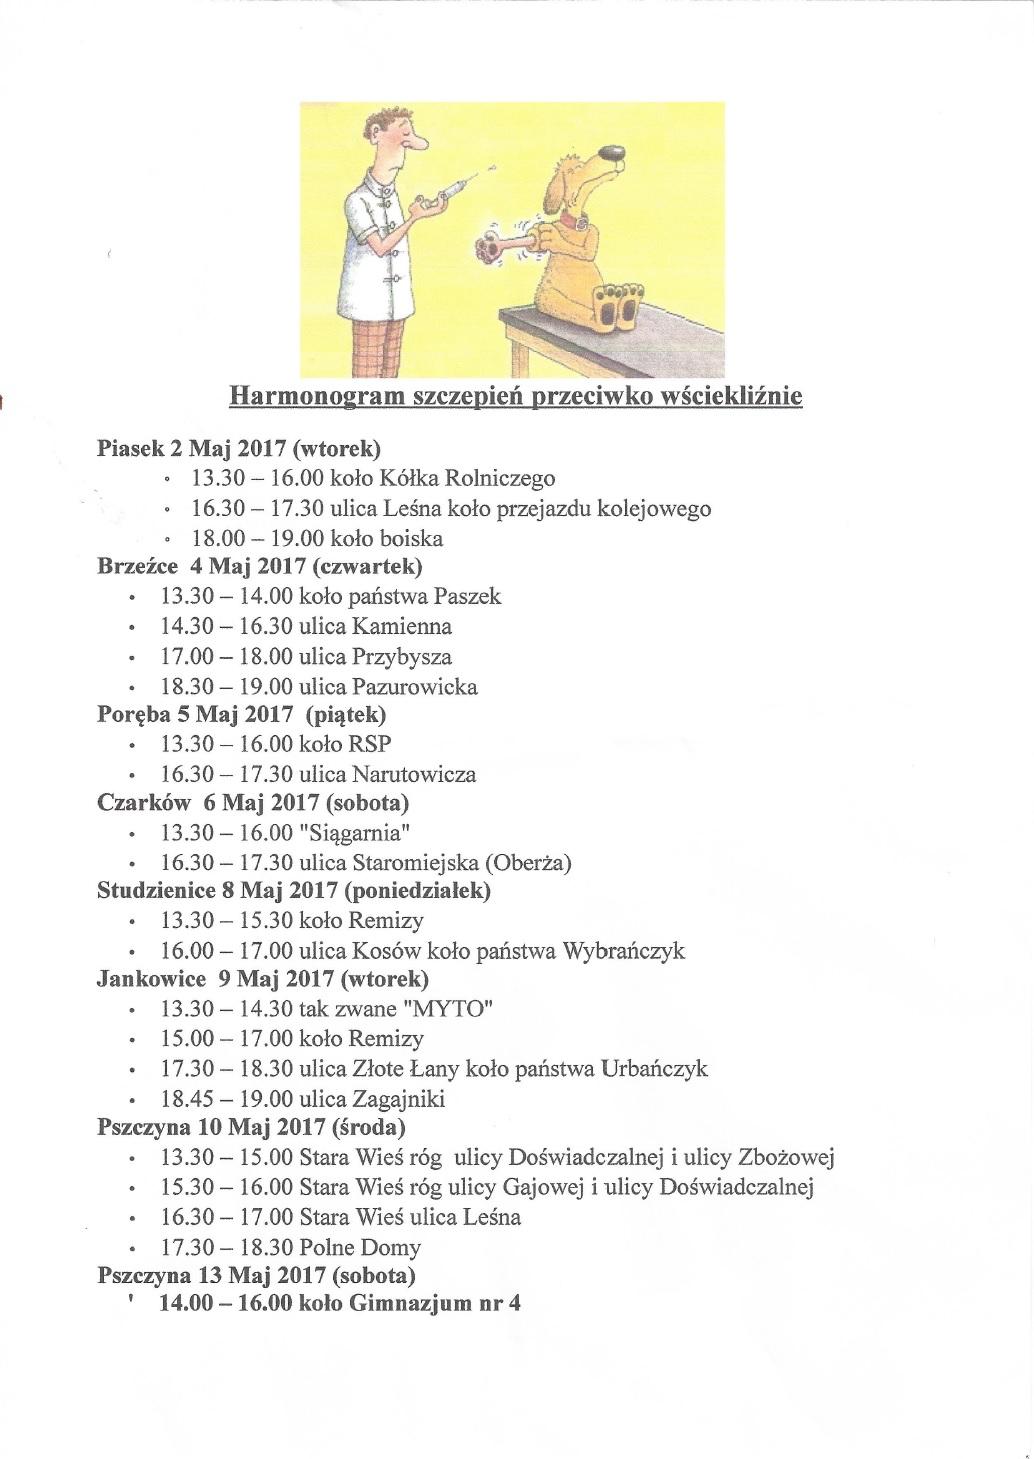 Harmonogram Szcepień